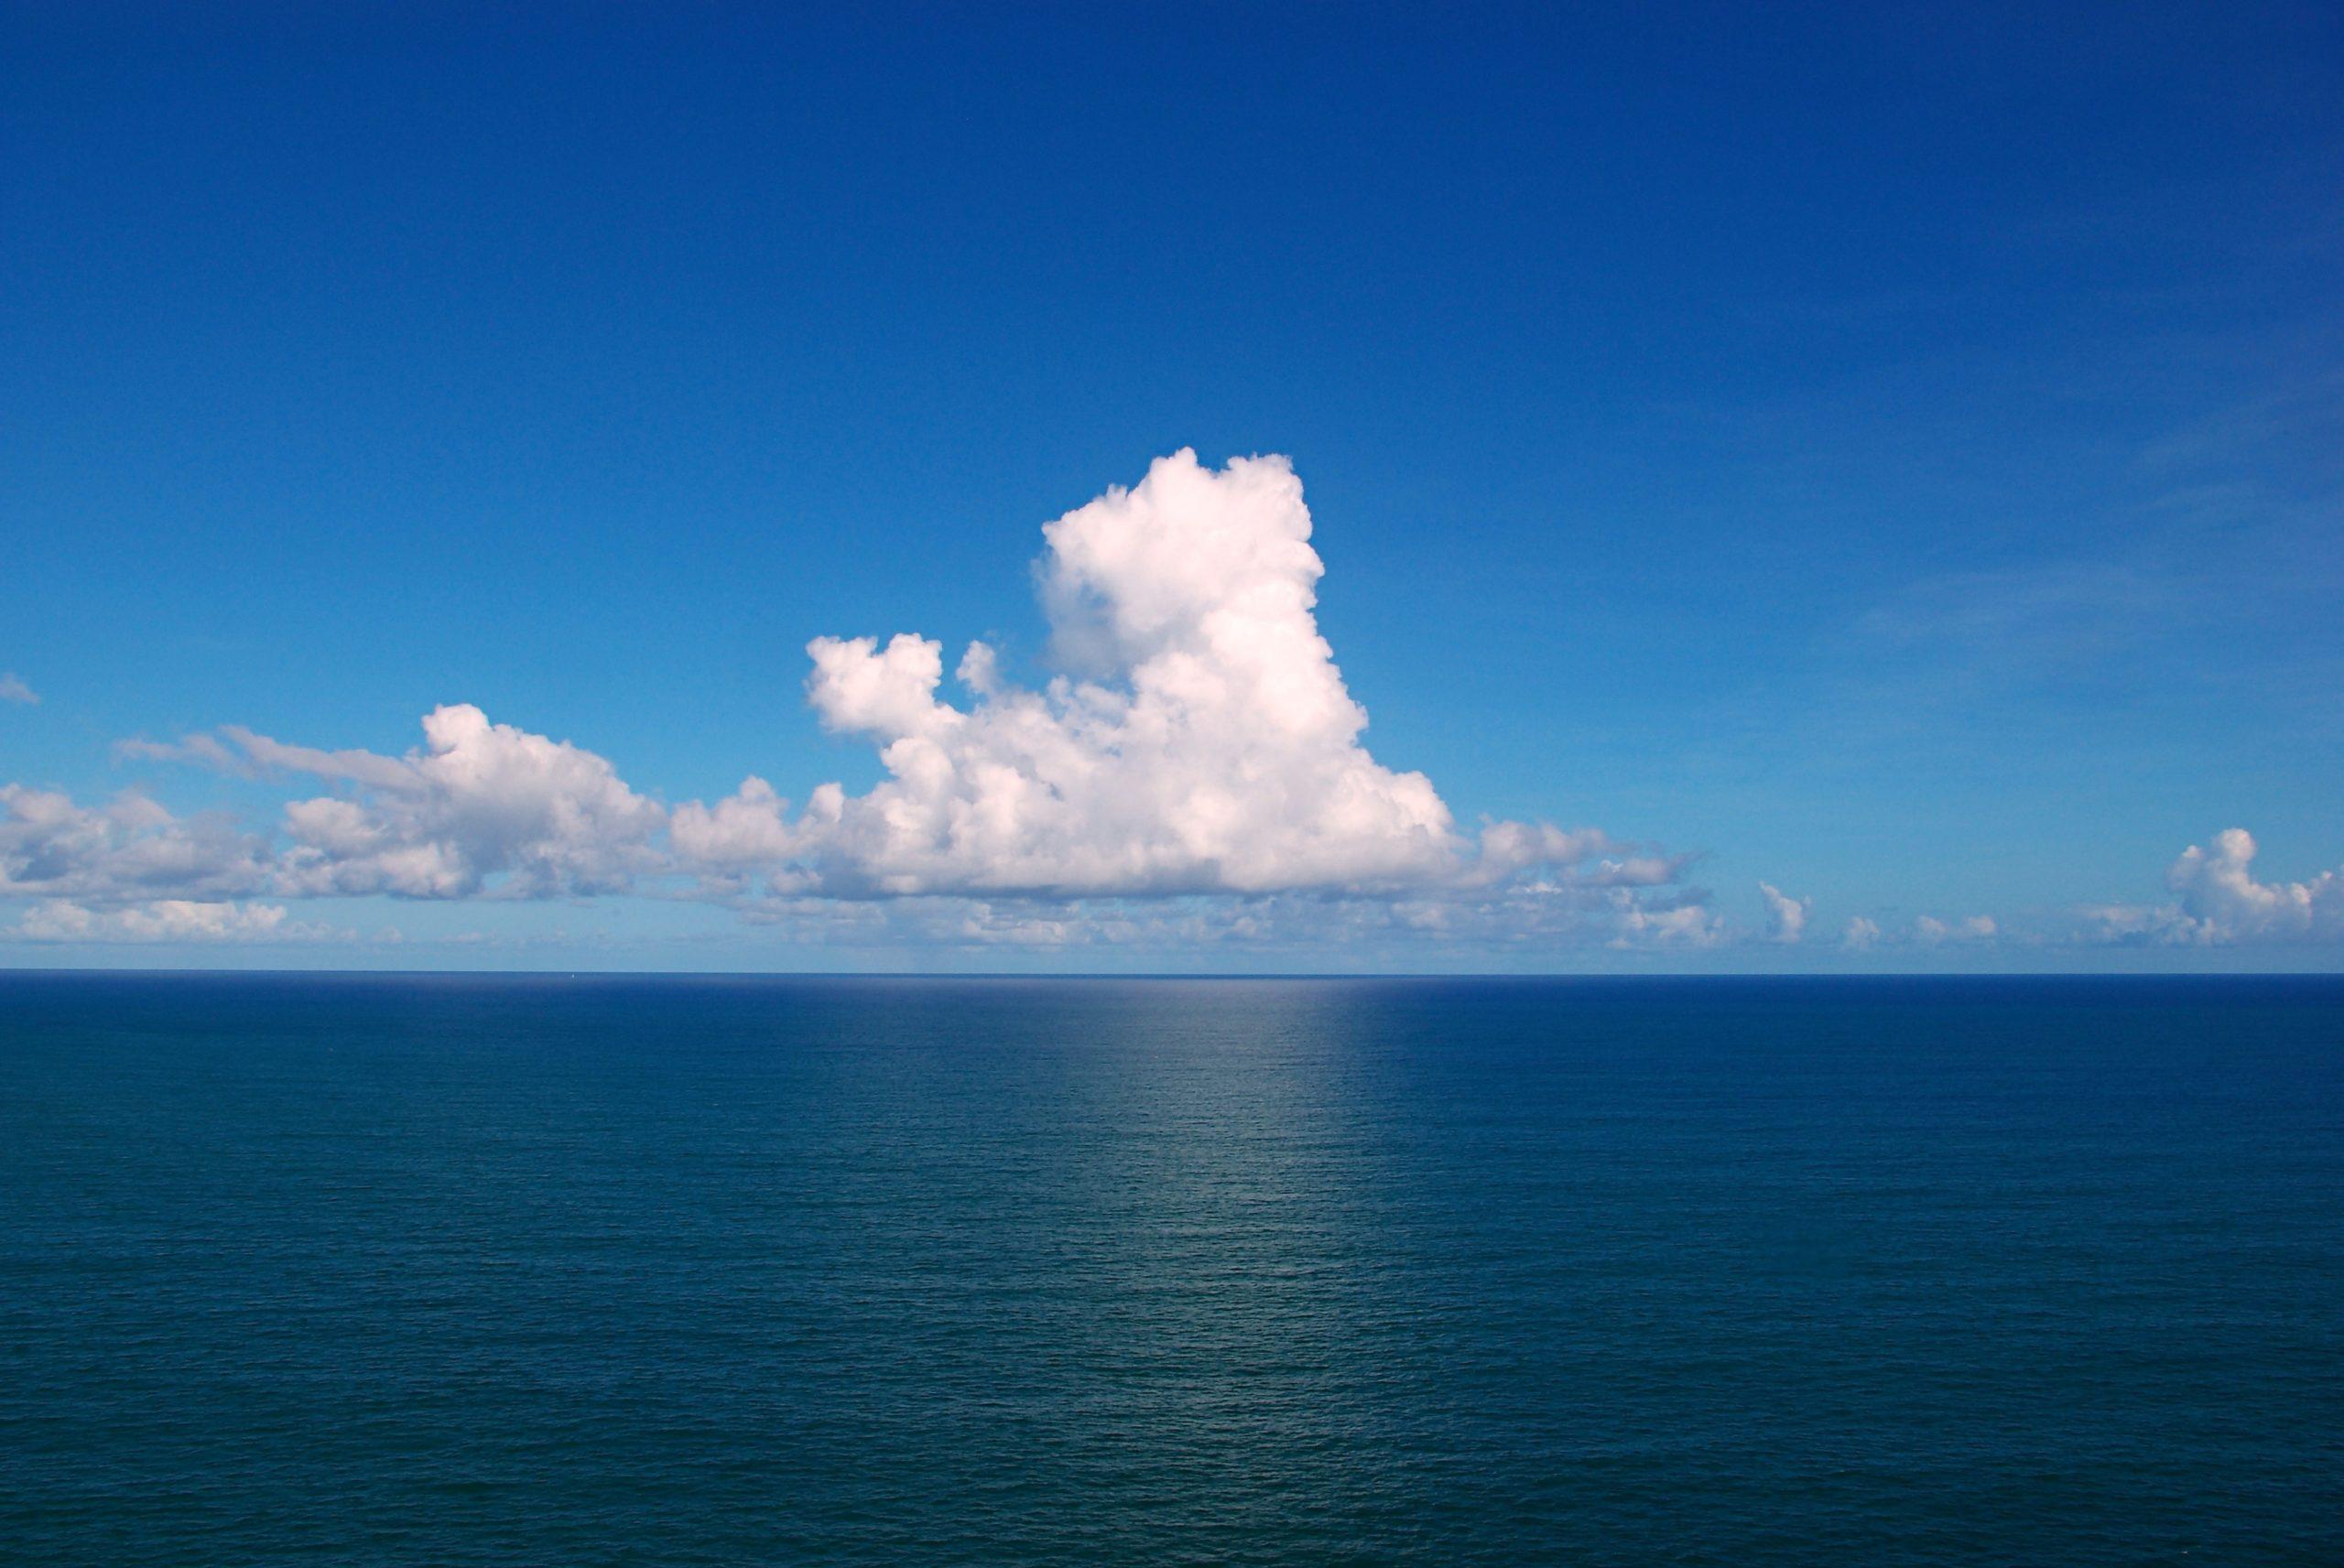 Cumulus sur l'Océan Atlantique, Salvador, Bahia, Brésil © wikimedia commons / Tiago Fioreze